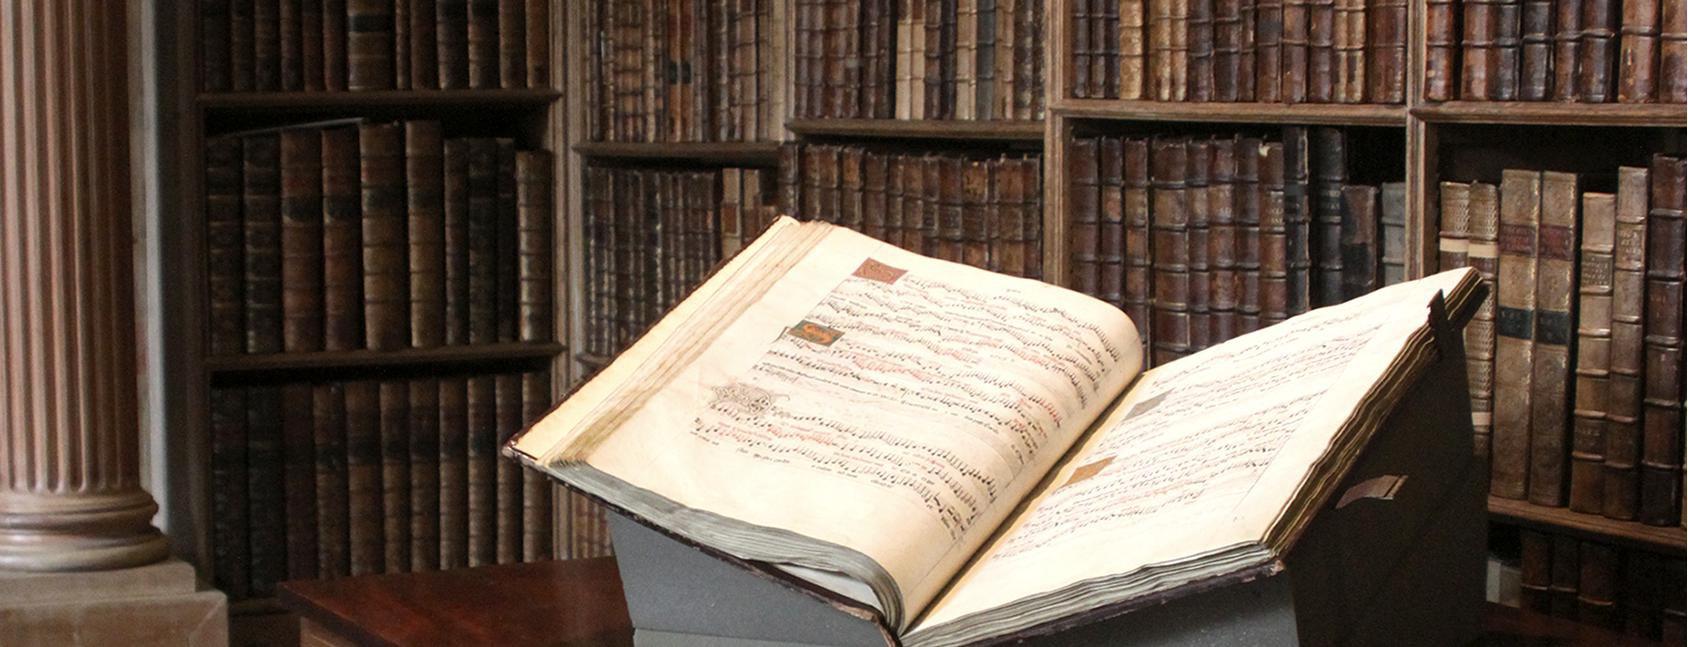 The Eton Choirbook